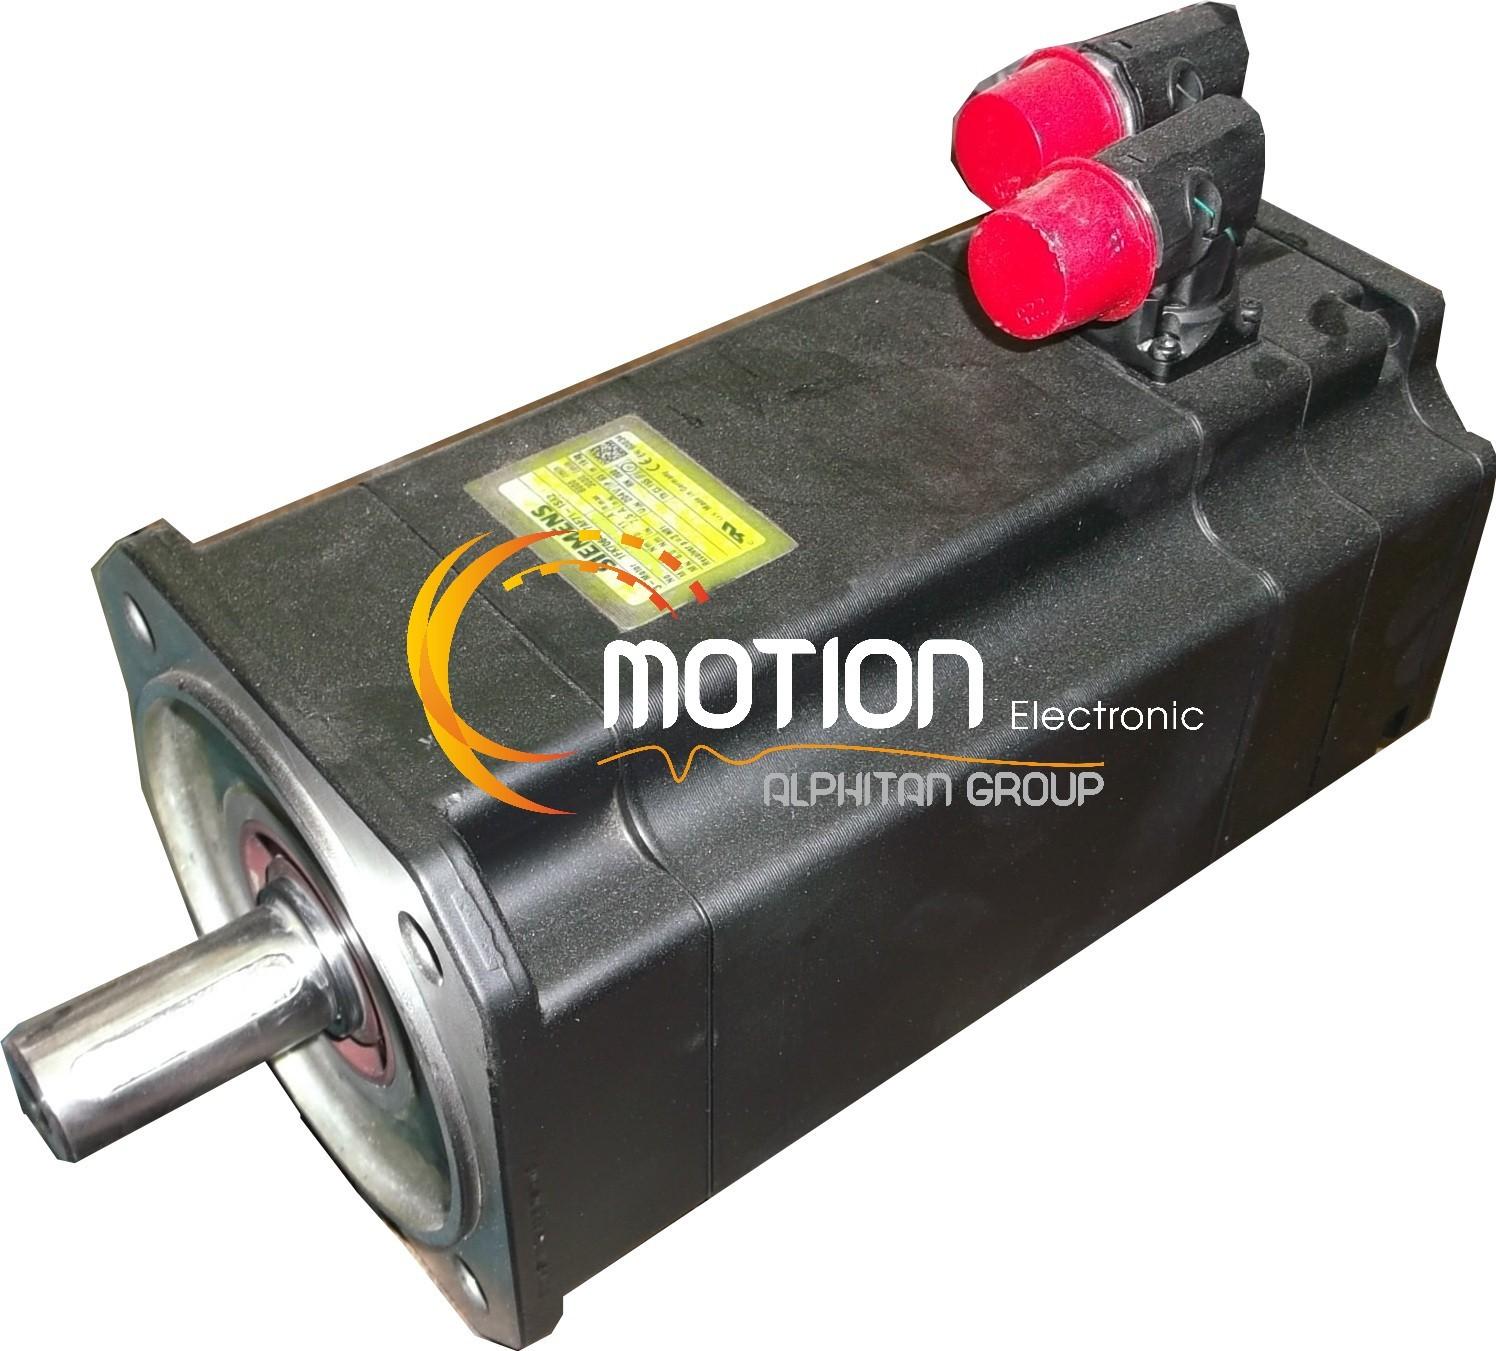 Siemens 1fk7064 7af71 1sa2 motor for Siemens electric motors catalog